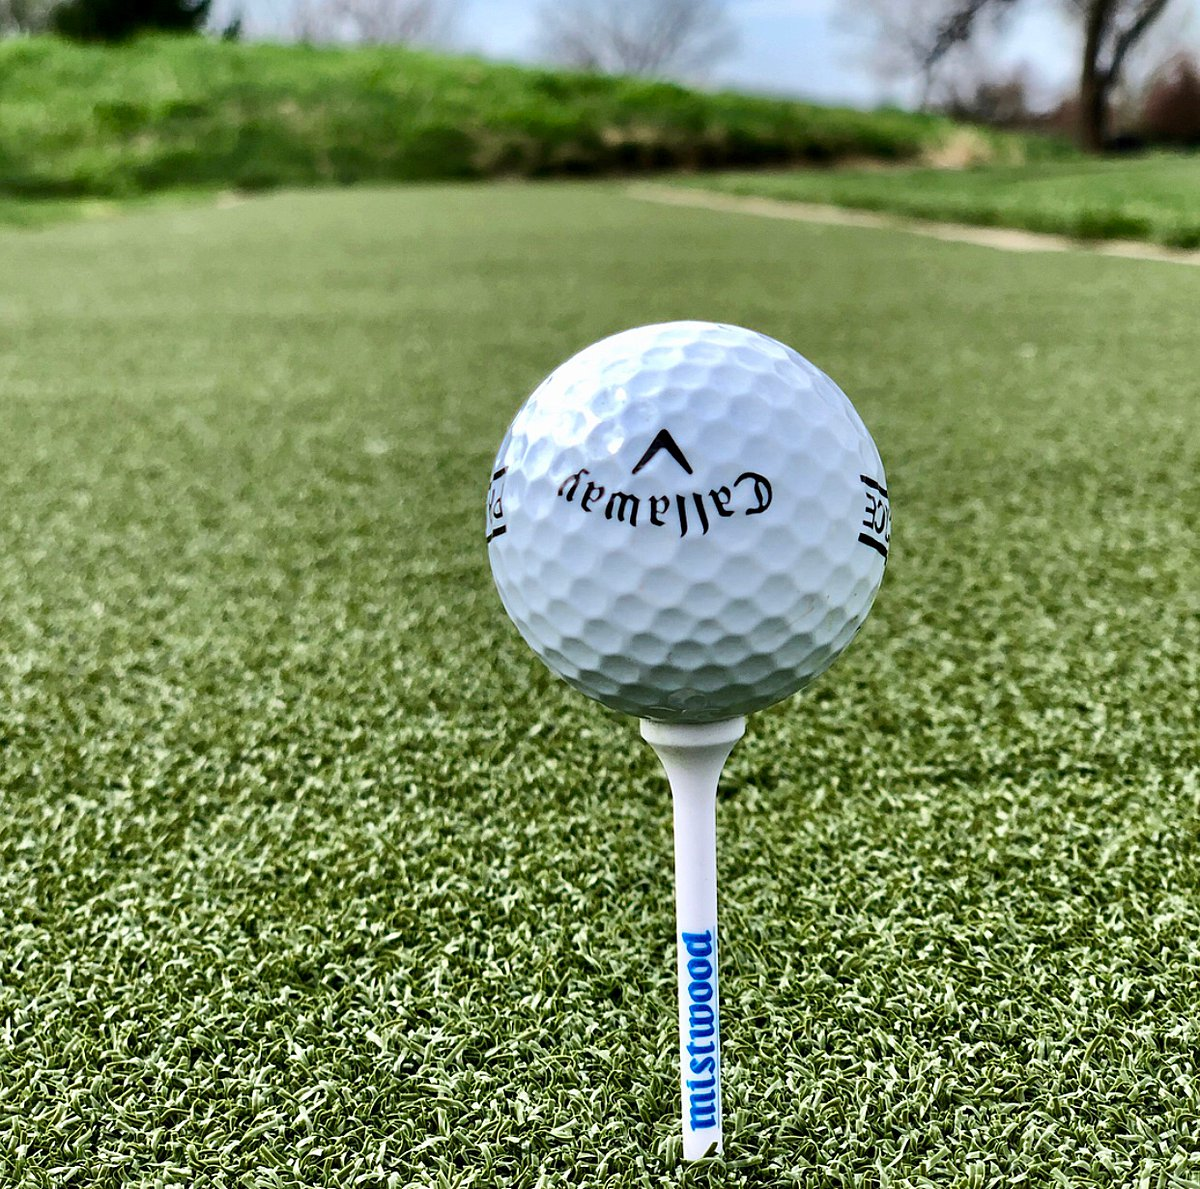 teeline-artificial-teeline-country-club-driving-range-teeline-mat-driving-range-mats-chicago-chicagoland-golf-course-teeline-turf-1